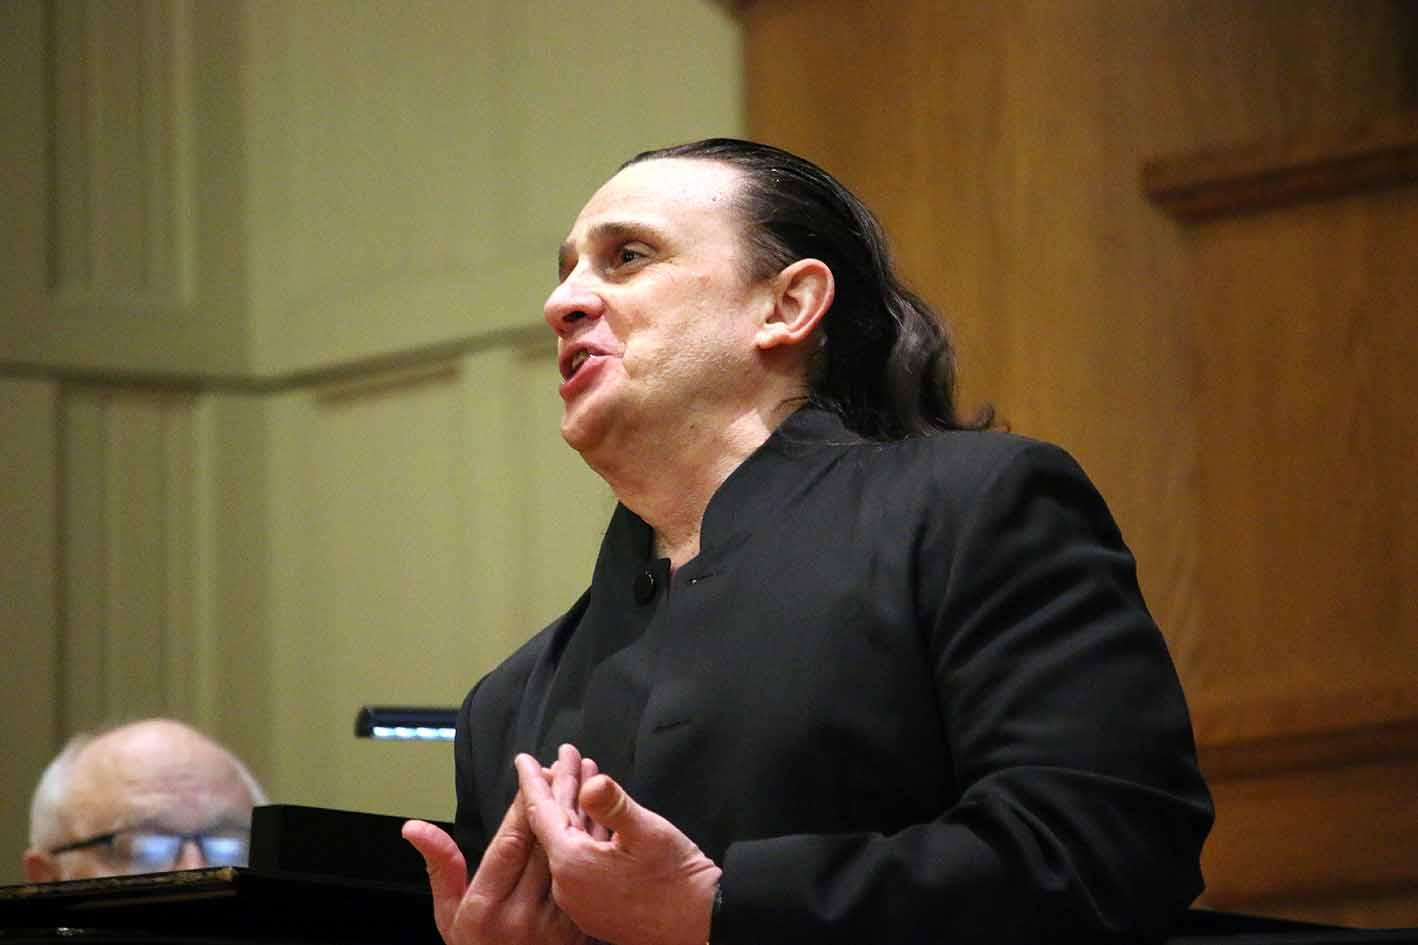 Opera Star Cangelosi Performs in Birmingham